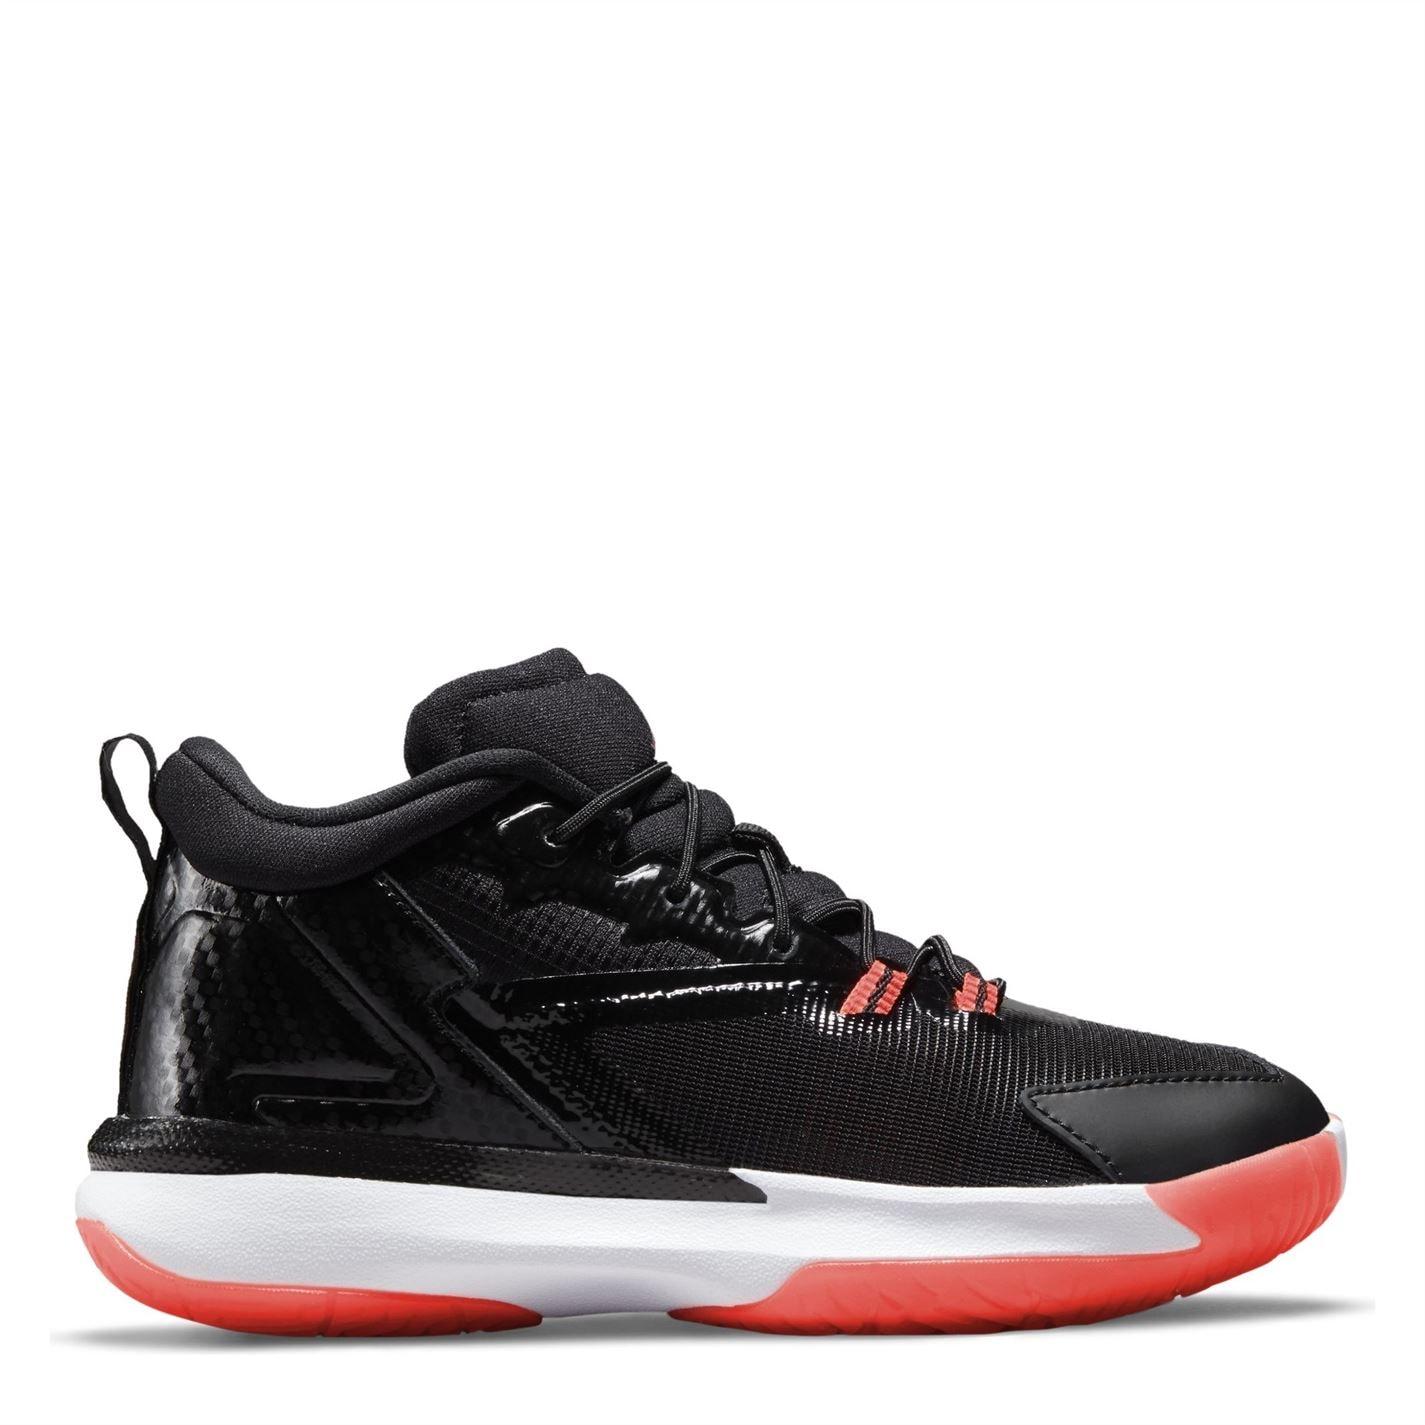 Adidasi pentru baschet Air Jordan Zion Z-Code baieti negru rosu alb